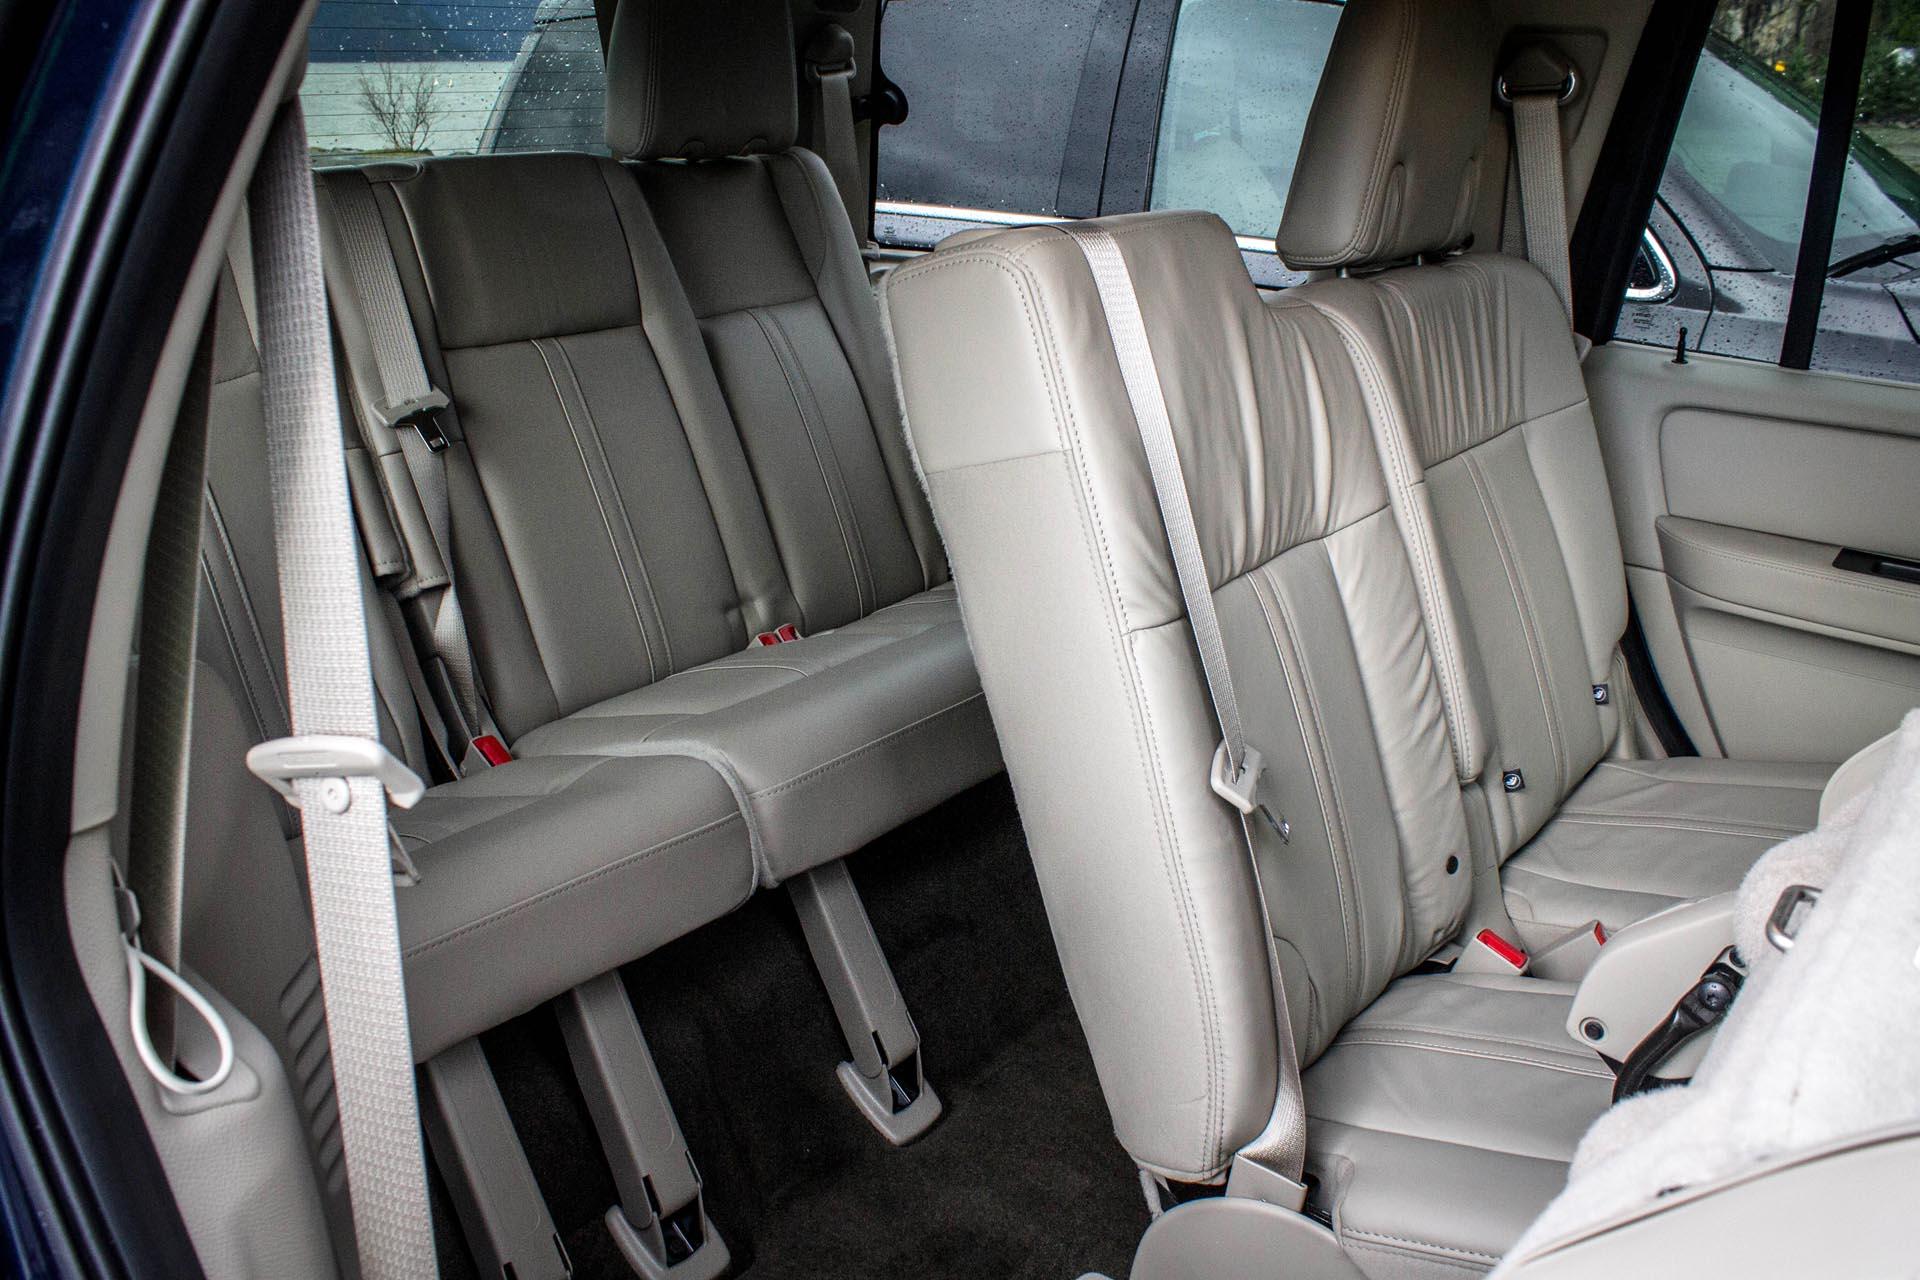 third-row seats